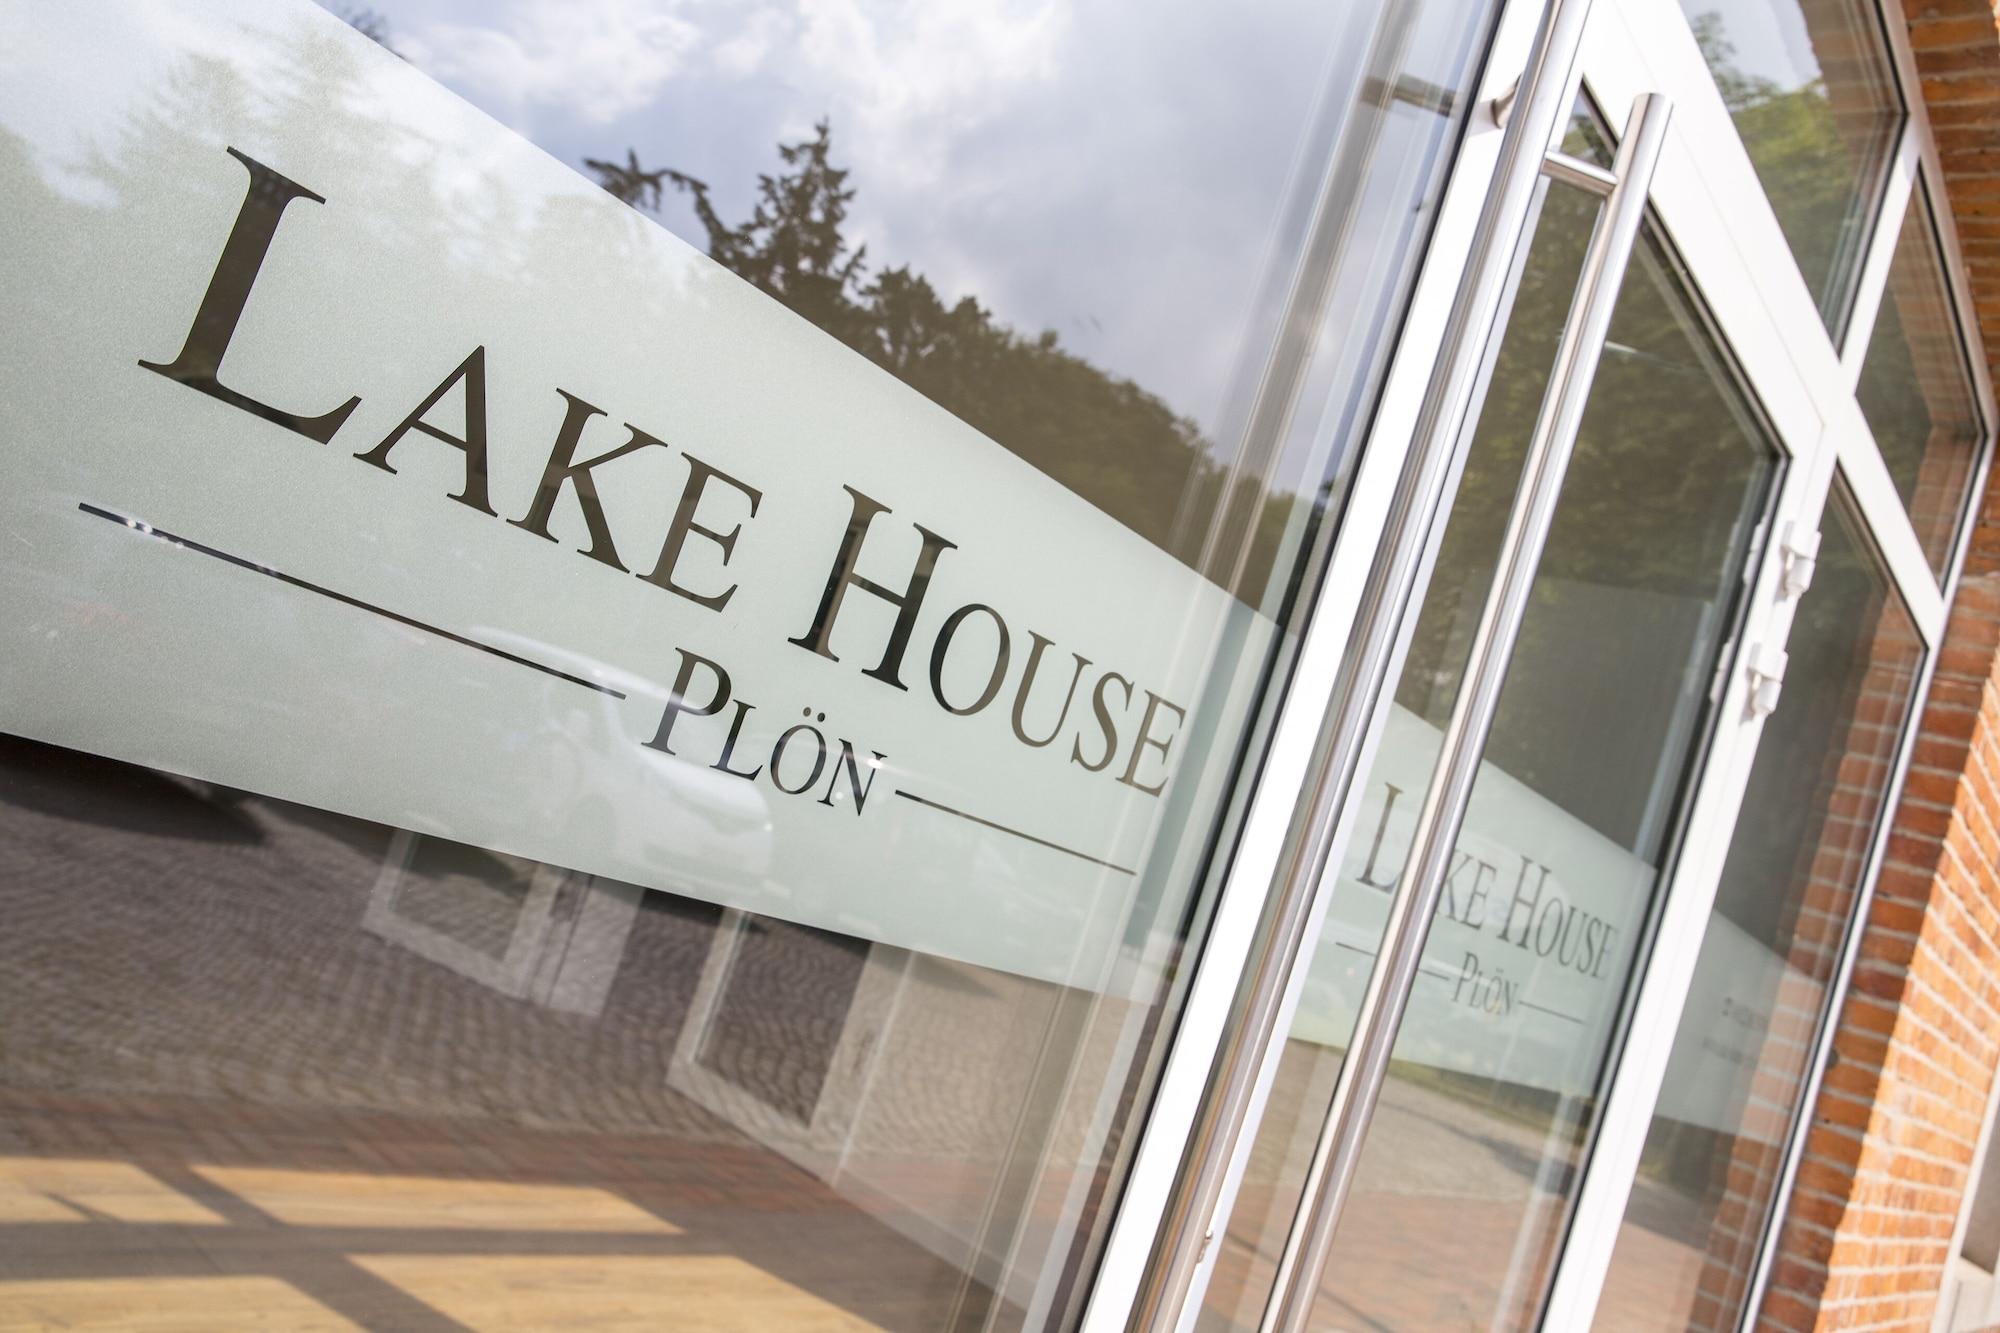 Lake House Plön, Plön